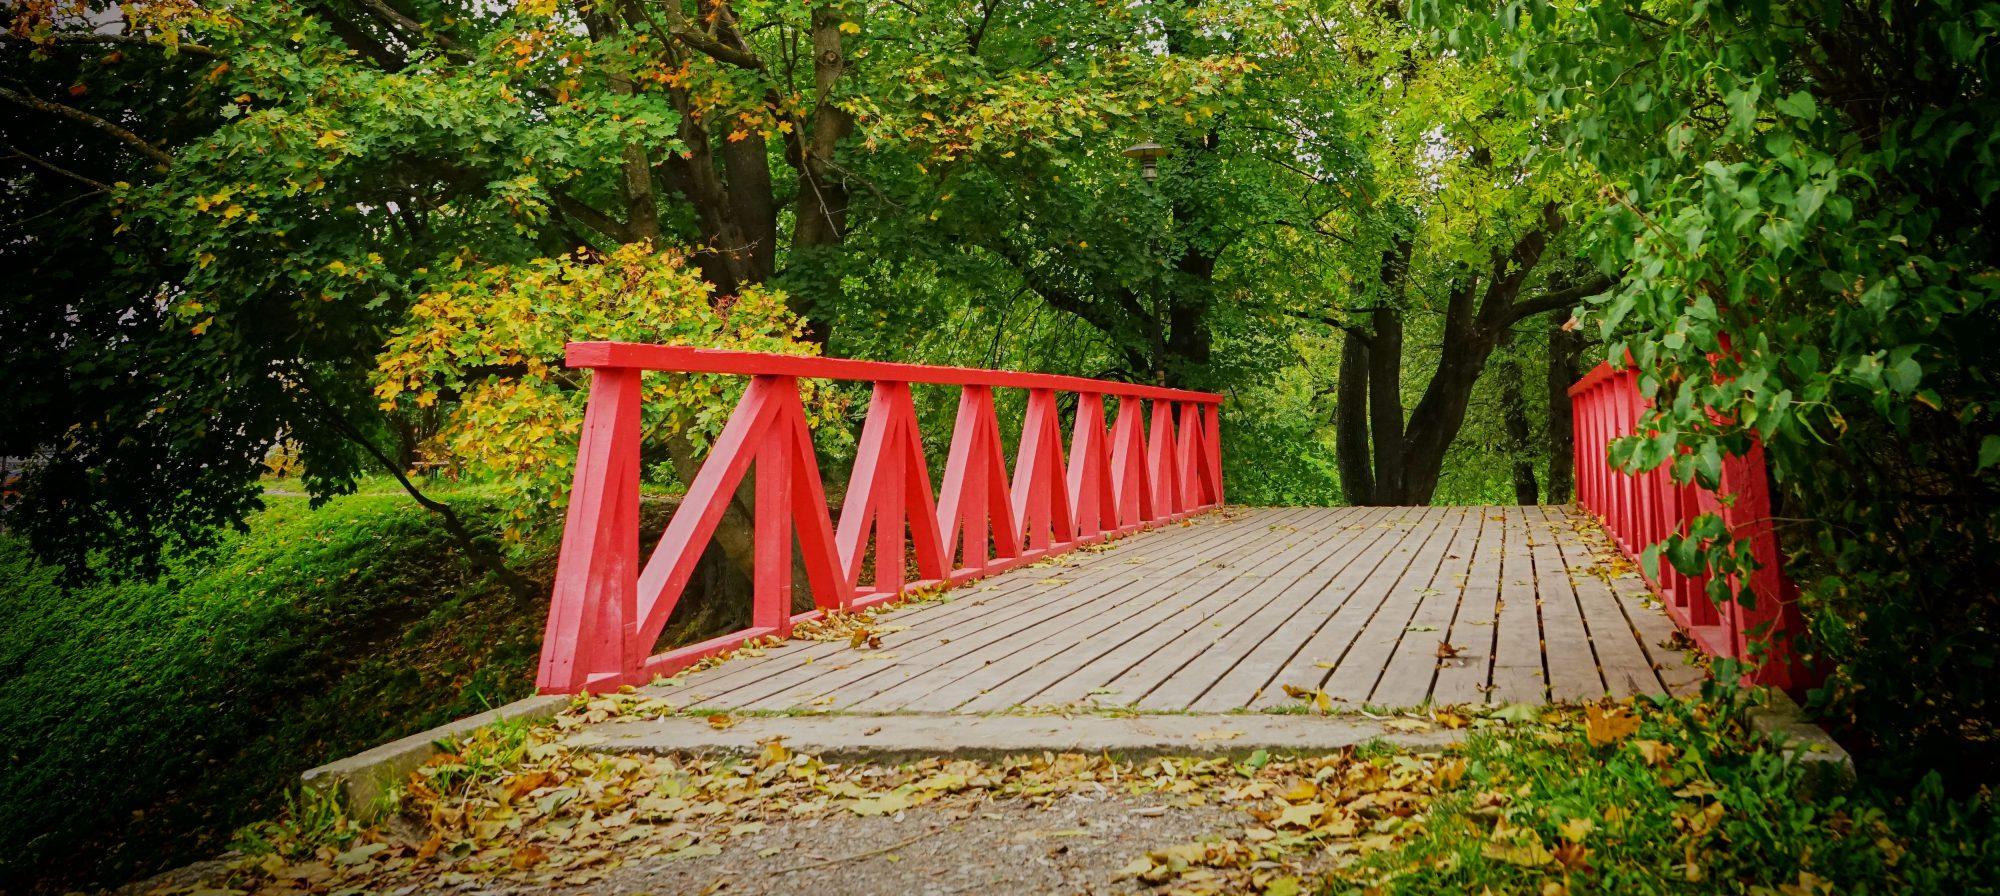 The Mindfulness Bridge